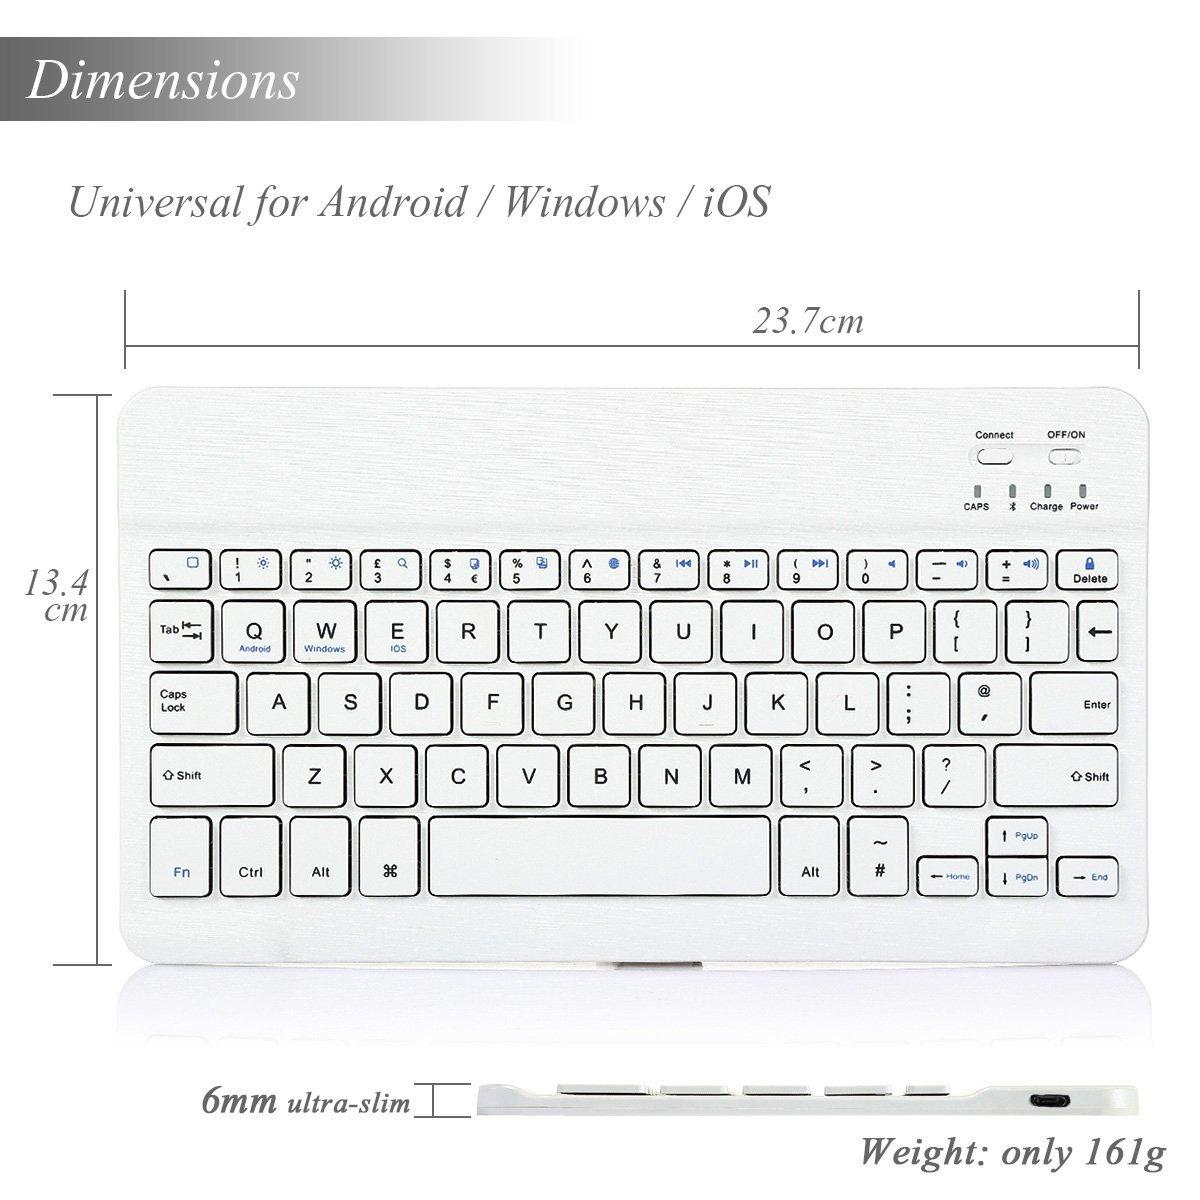 CoastaCloud Portable 10-inch Ultra Slim ABS Wireless Bluetooth Keyboard for iPad 10.5, iPad 9.7'', iPad Pro, iPad Air, iPad 2/3/4, Galaxy Tab Note and Any iOS, Android, Windows Tablets (White) by CoastaCloud (Image #4)